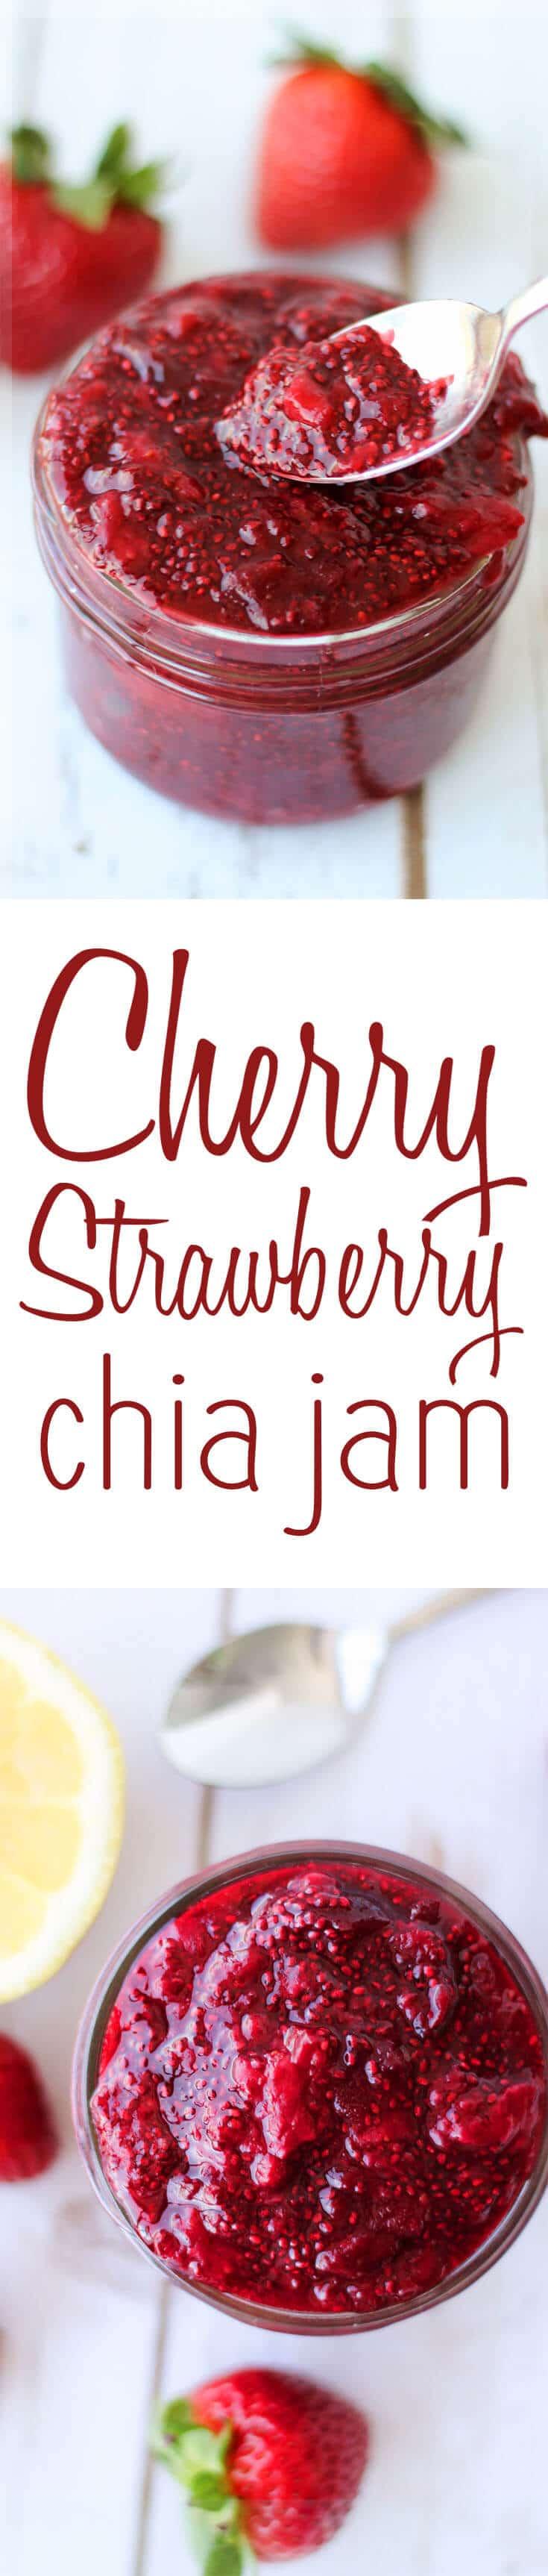 cherry strawebrry chia jam